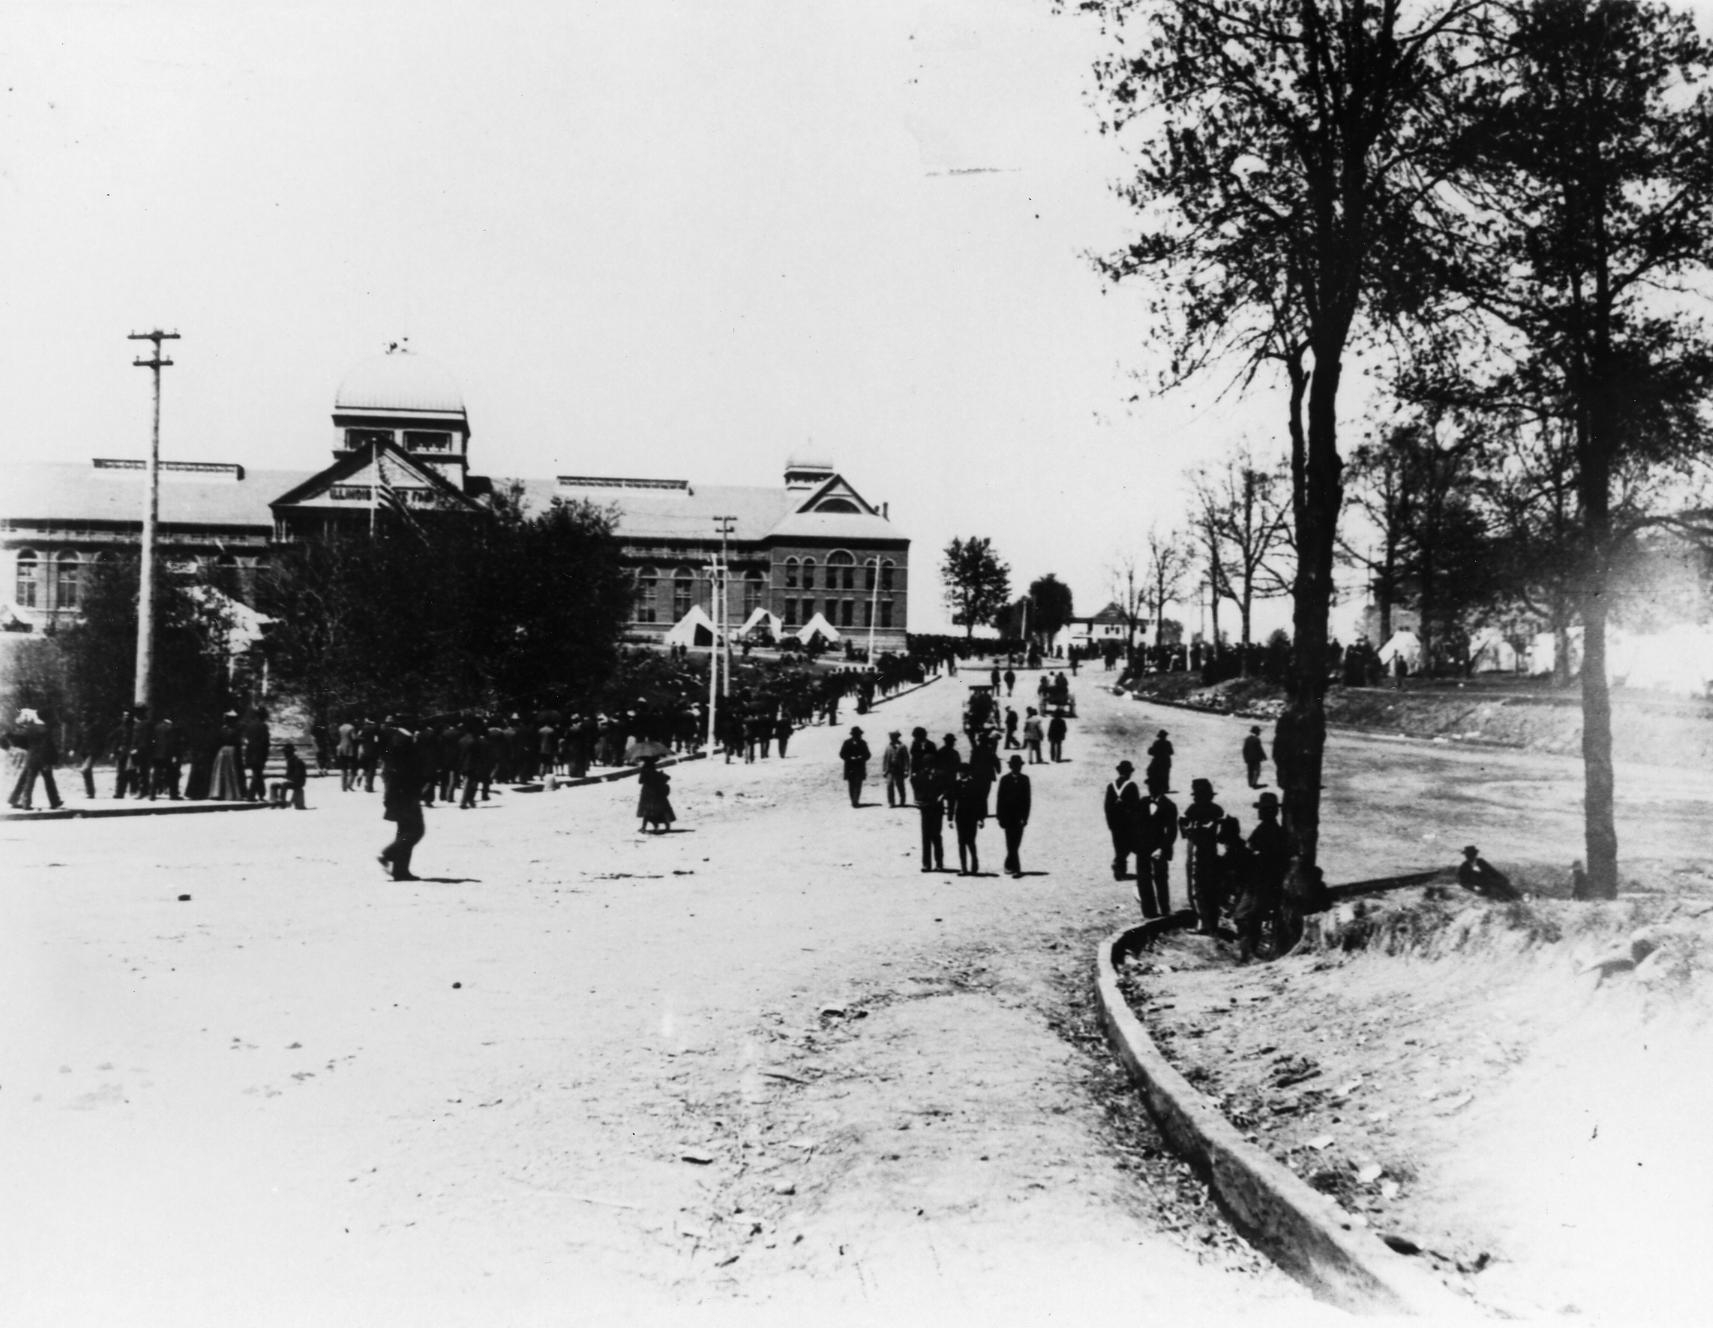 91-568002 SVC-LL Exposition building - Circa 1895.jpg